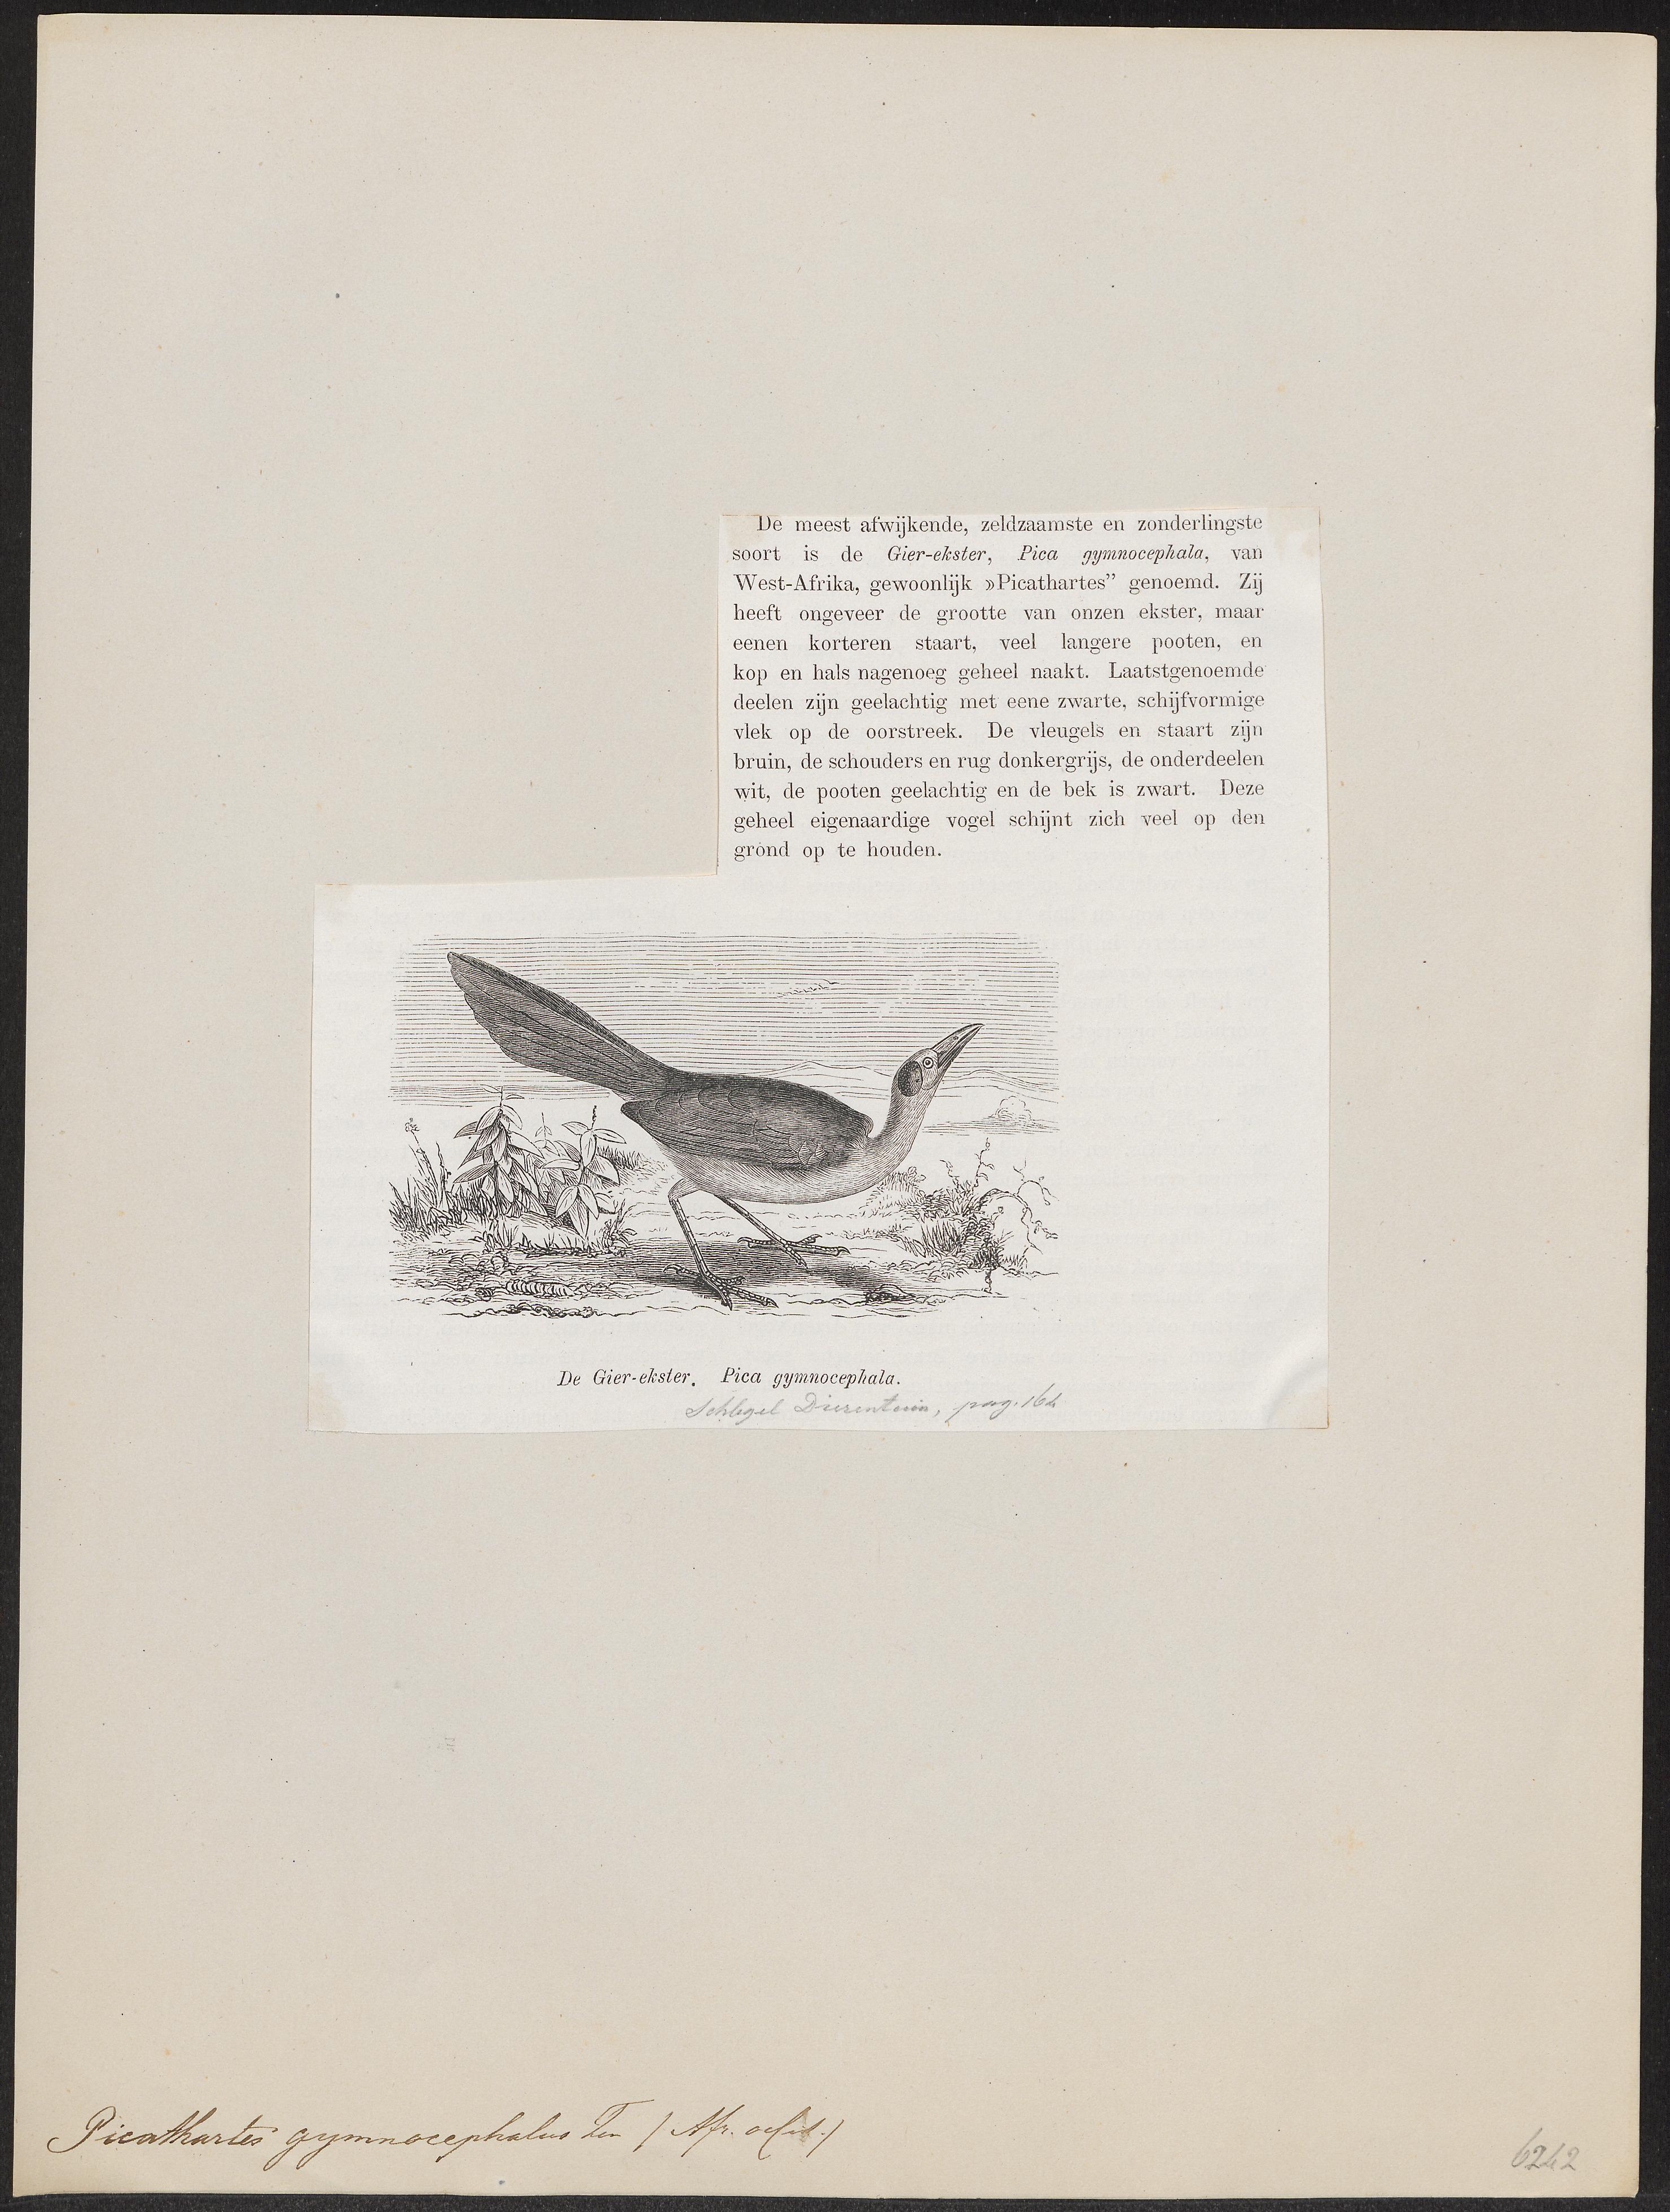 Image of Bare-headed Rockfowl